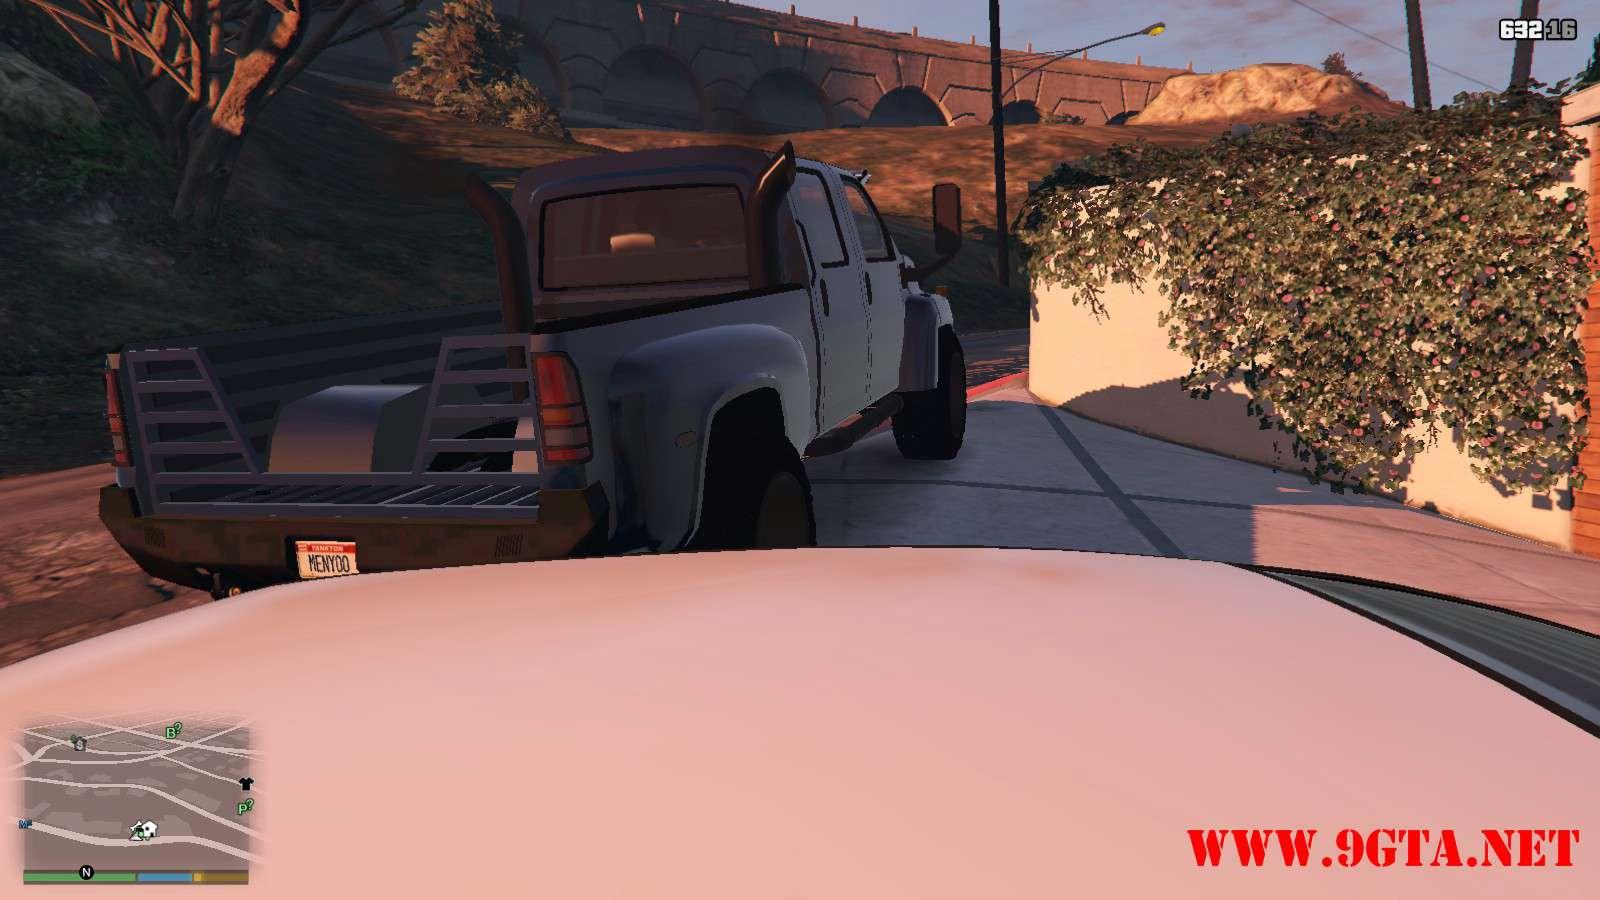 2009 GMC Topkick Truck GTA5 Mods (17)